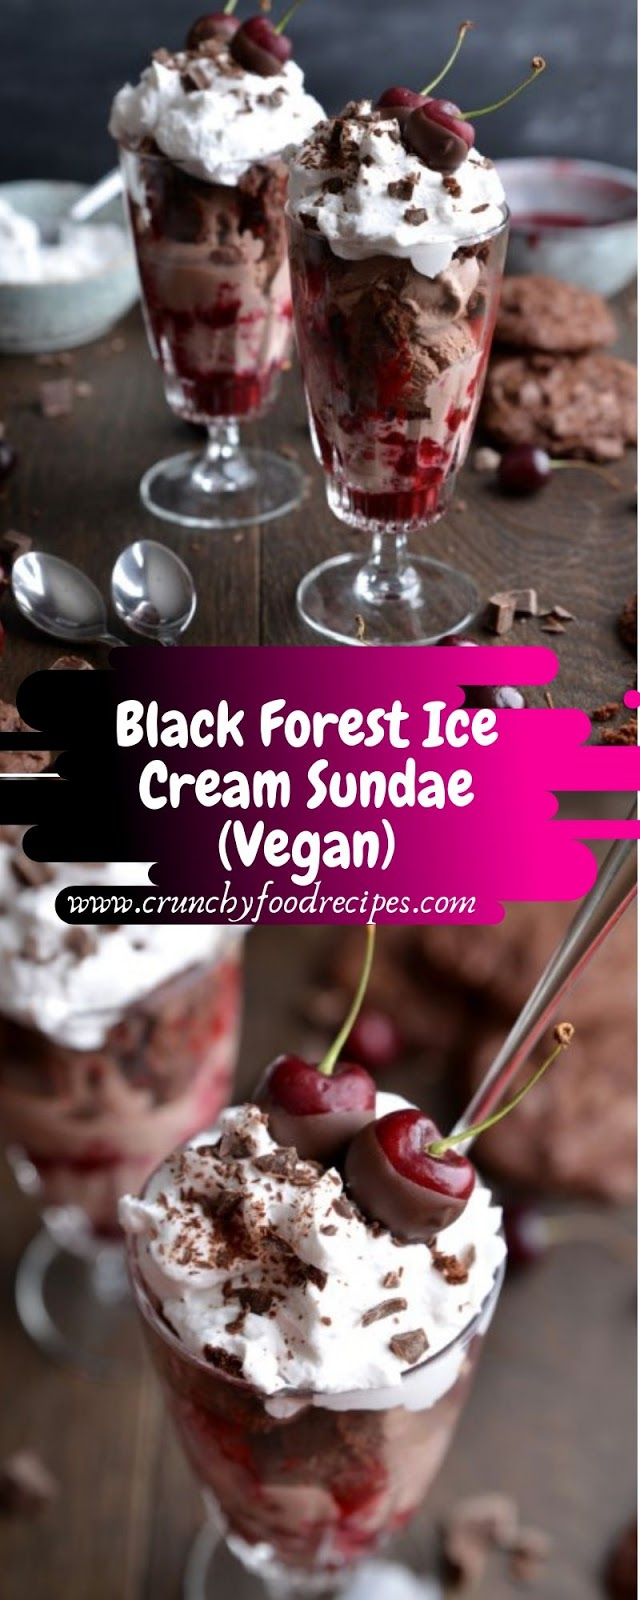 Black Forest Ice Cream Sundae (Vegan)